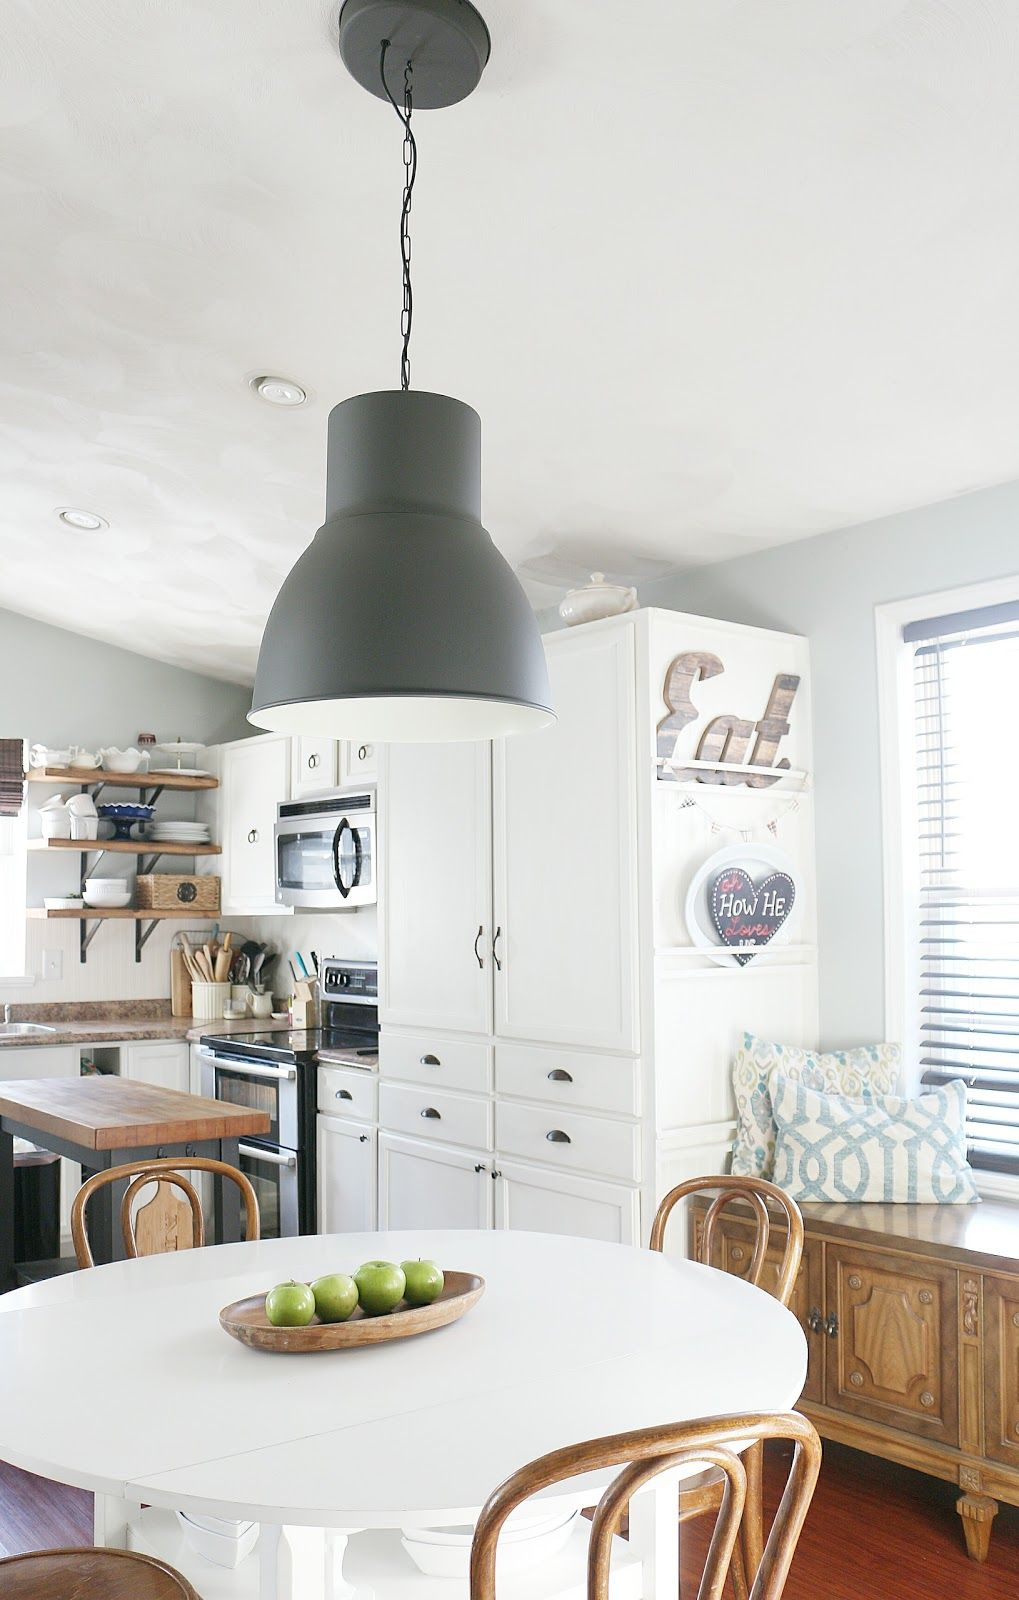 New Dining Room Lighting Ikea Hektar Pendant For The Home